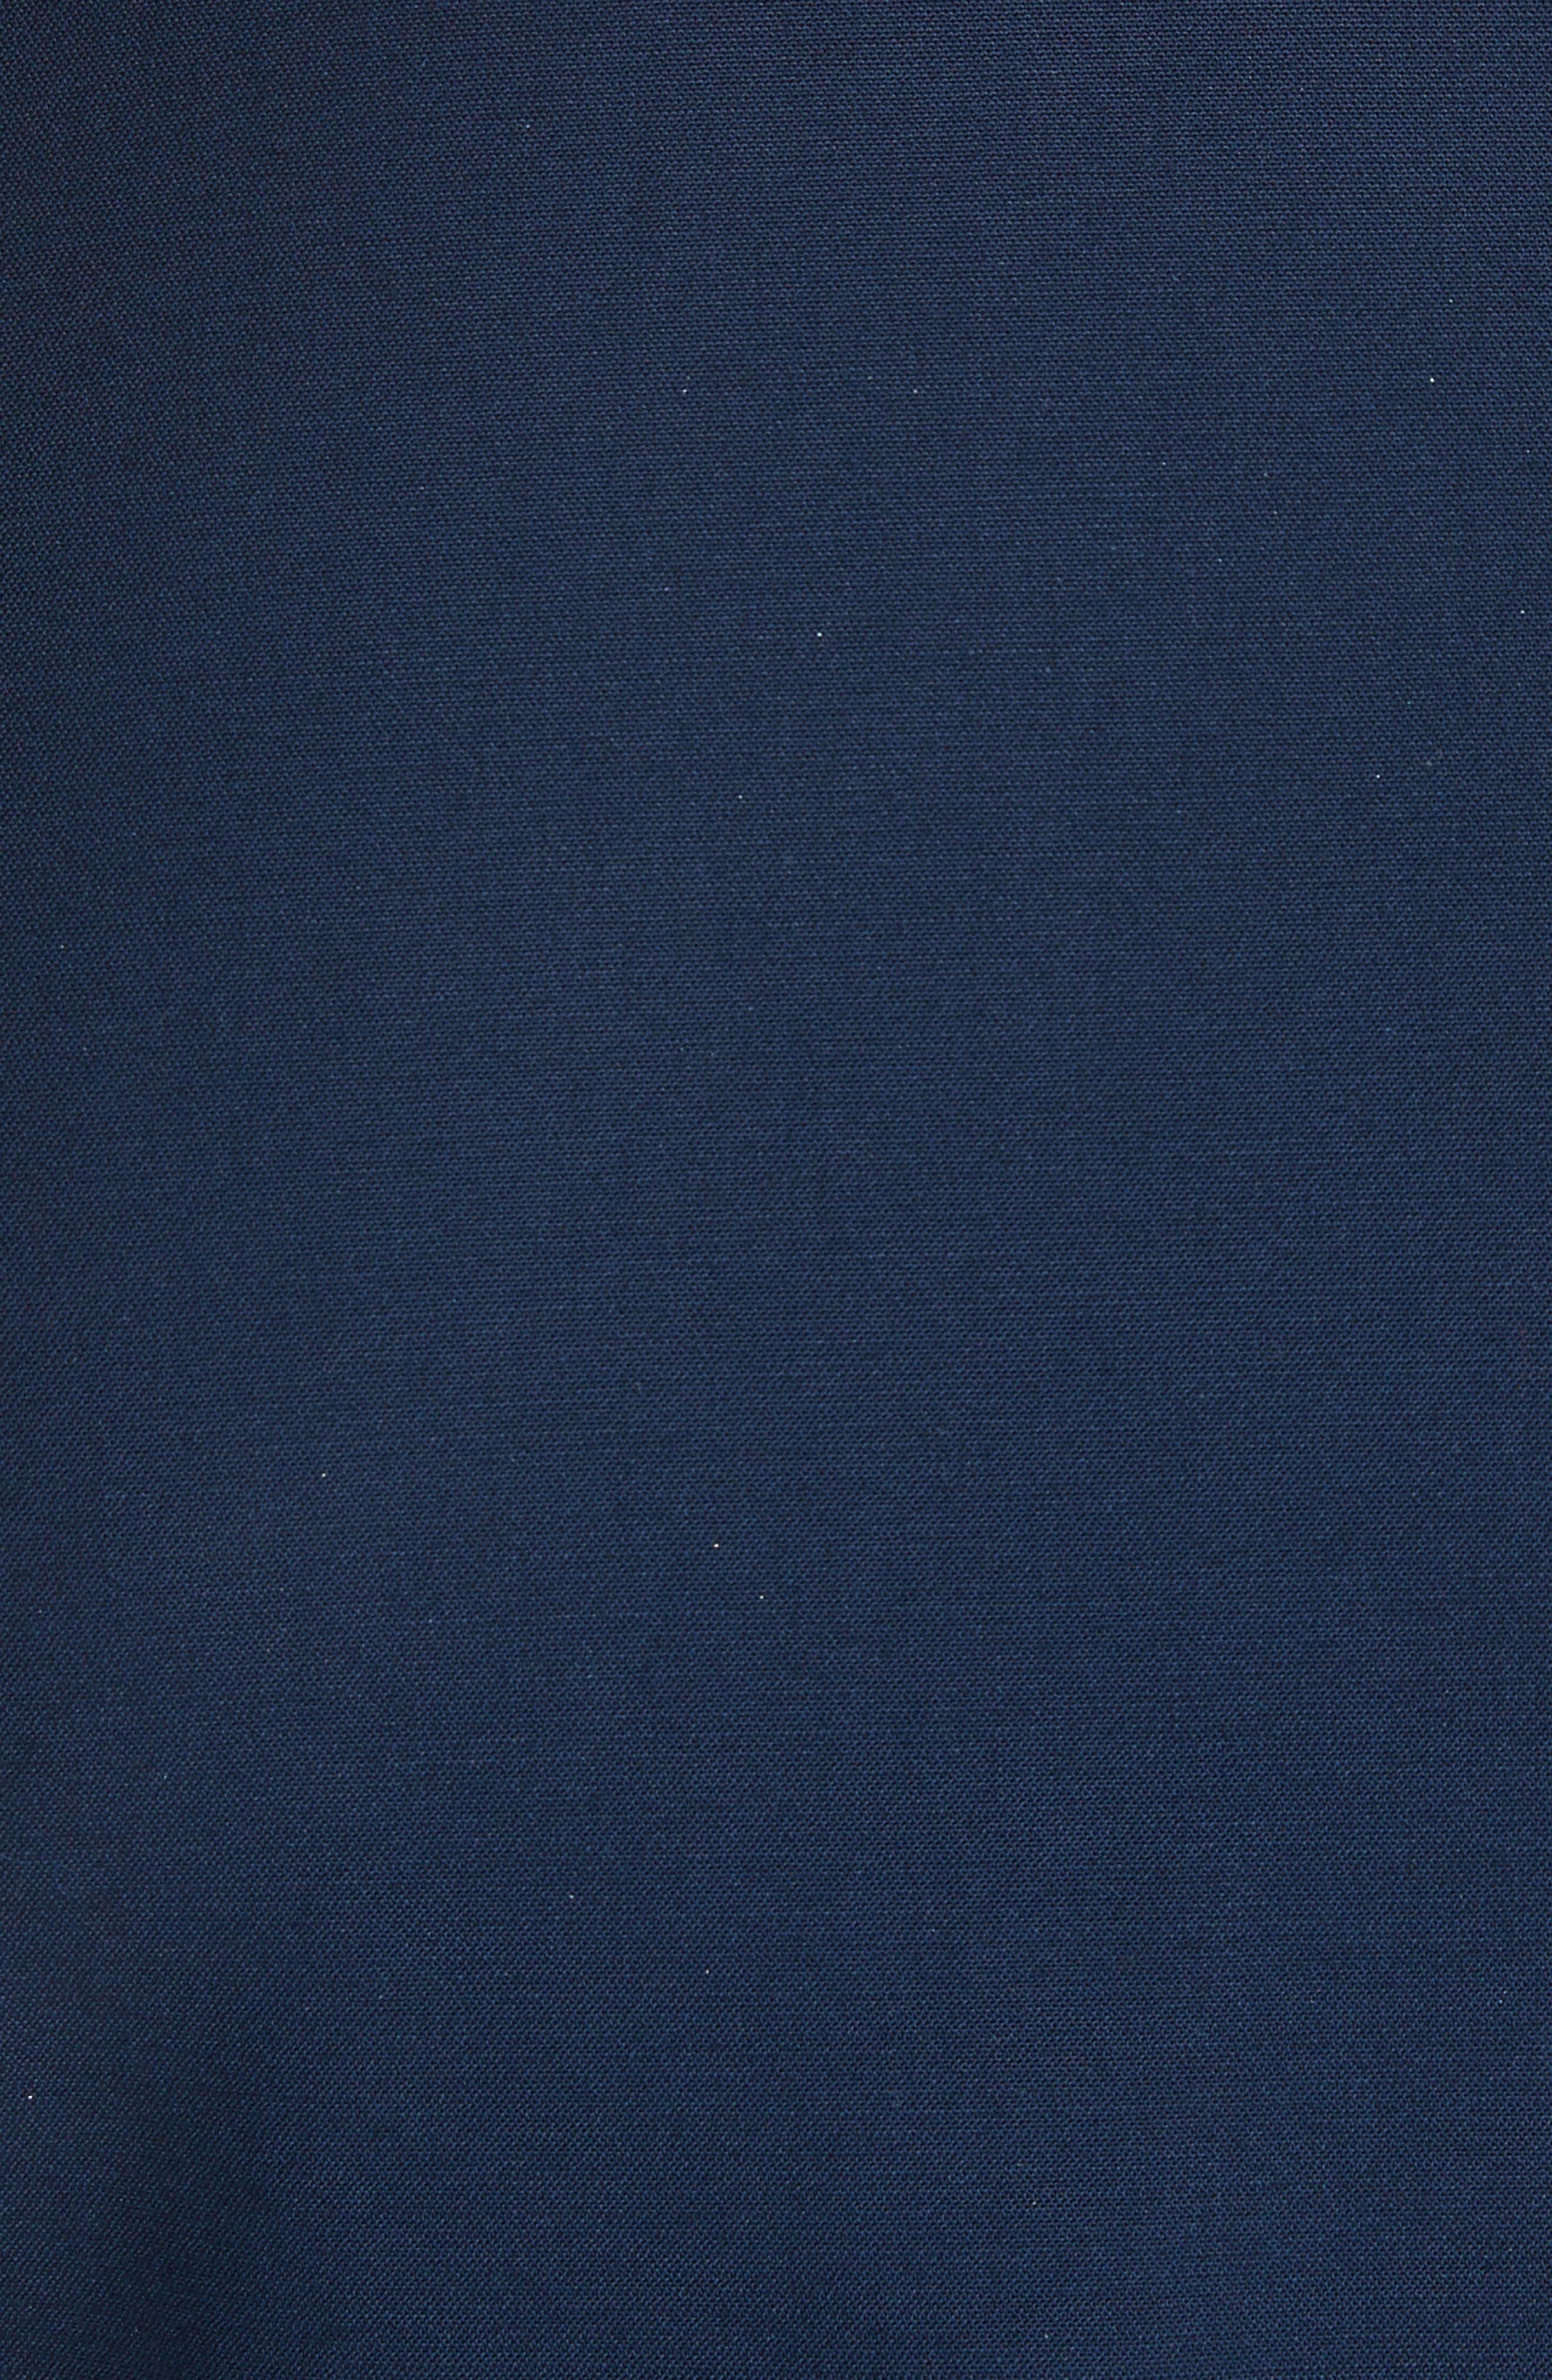 Ruffle Pocket A-Line Dress,                             Alternate thumbnail 5, color,                             410